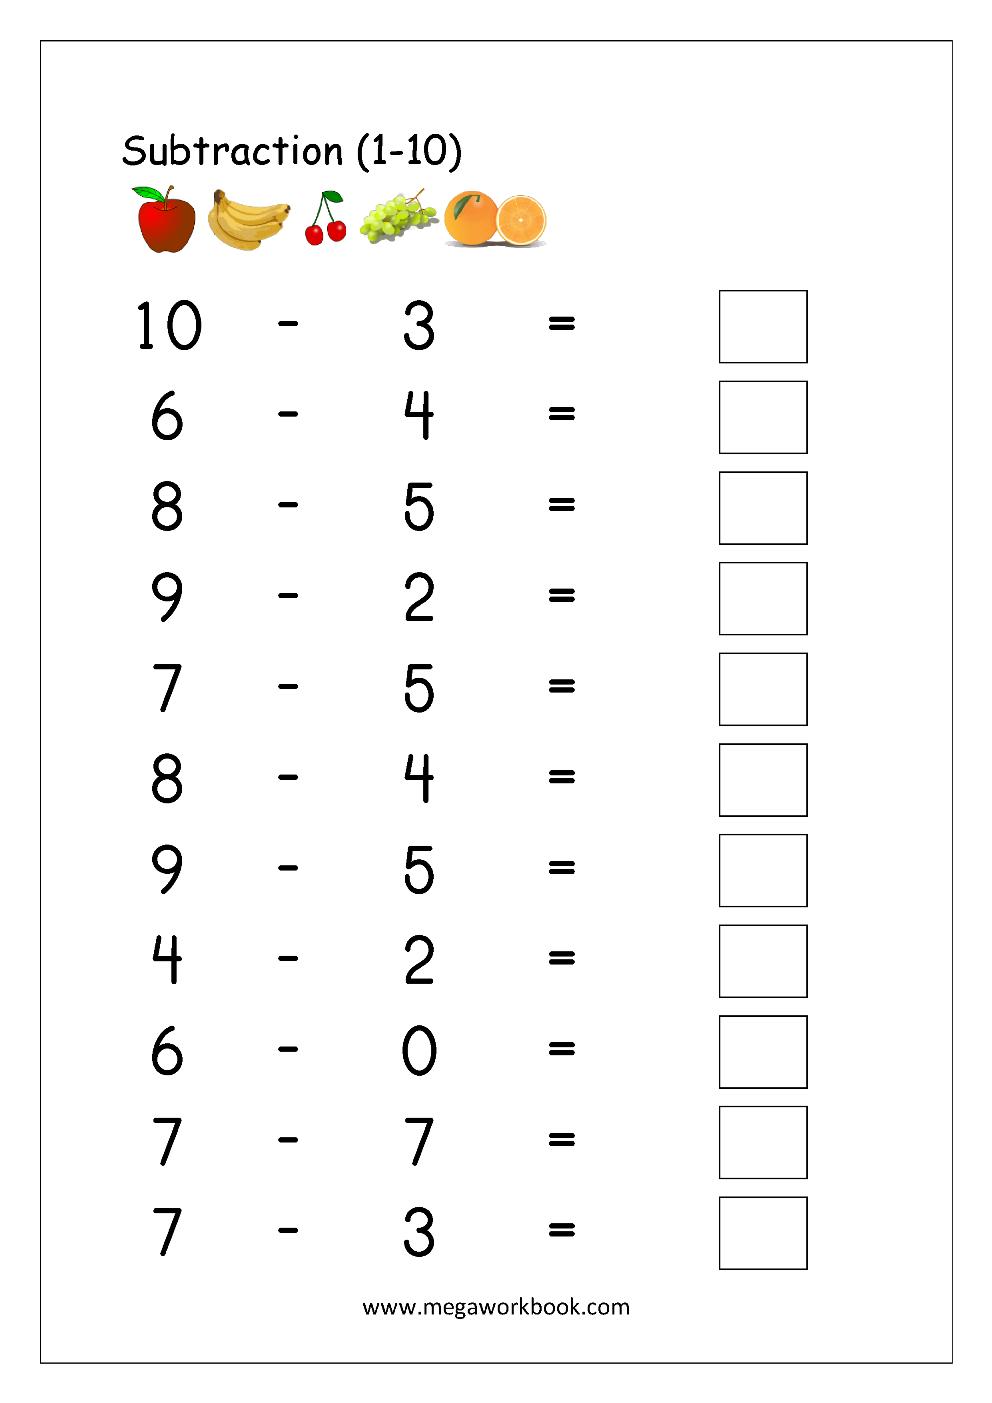 hight resolution of Math Worksheet - Subtraction (1-10)   Math subtraction worksheets